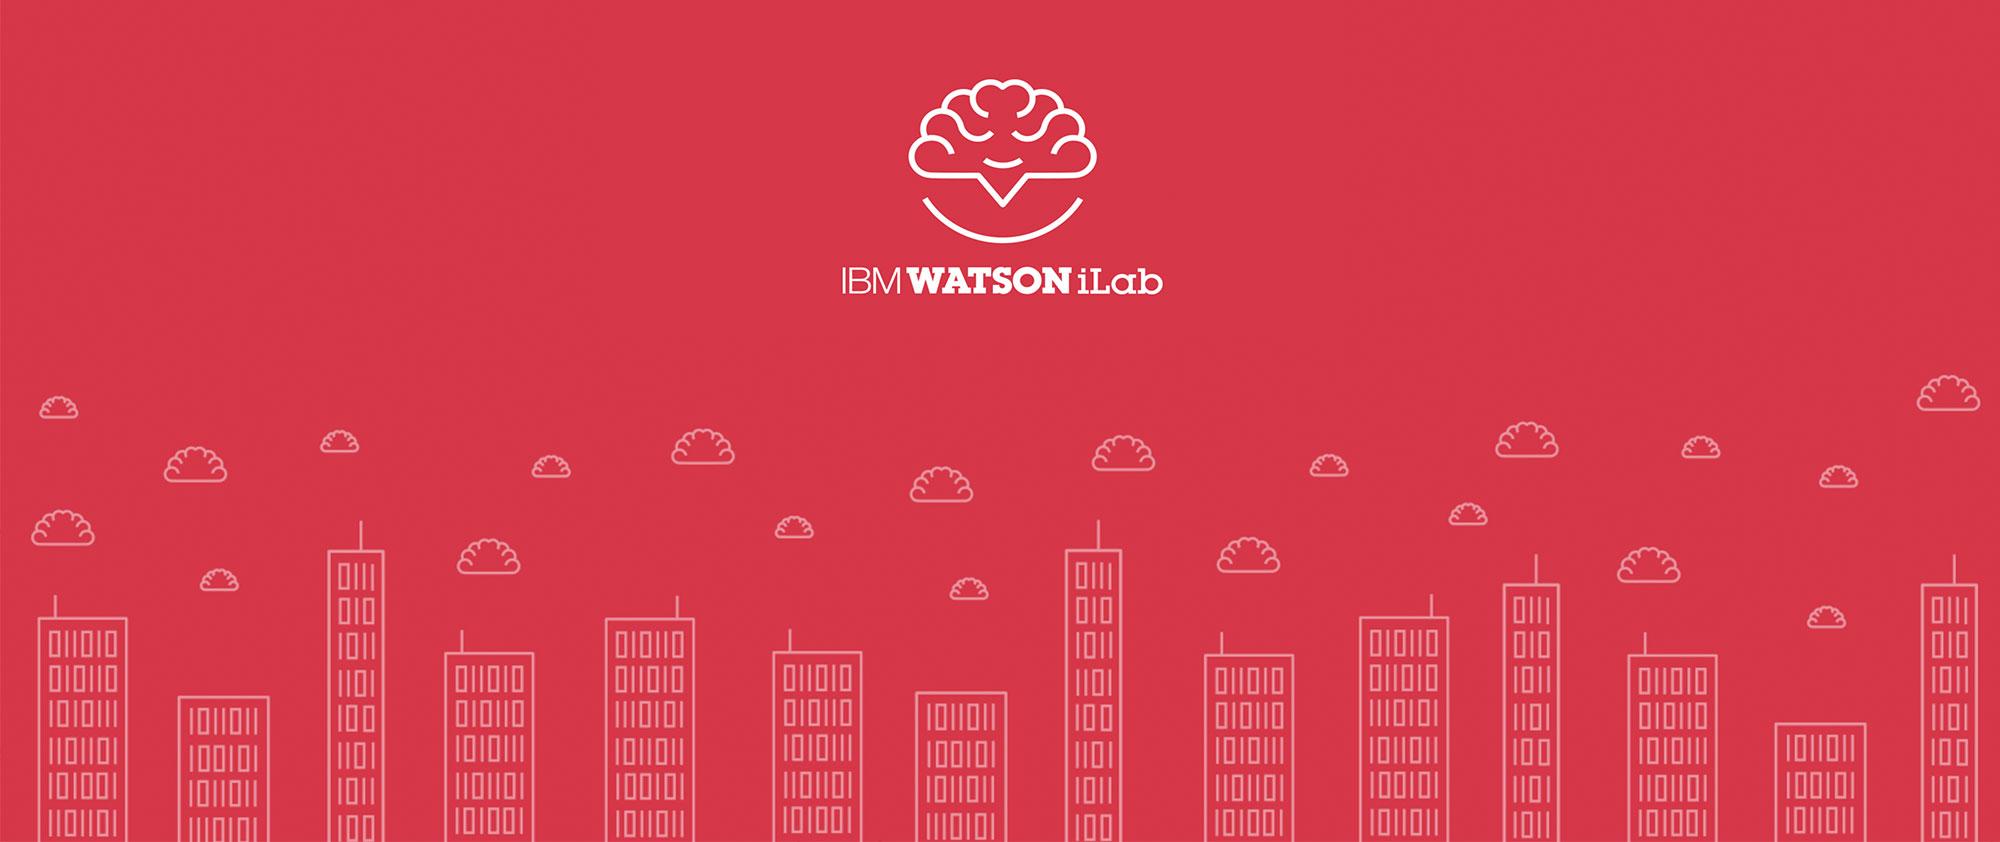 IBM Watson iLab